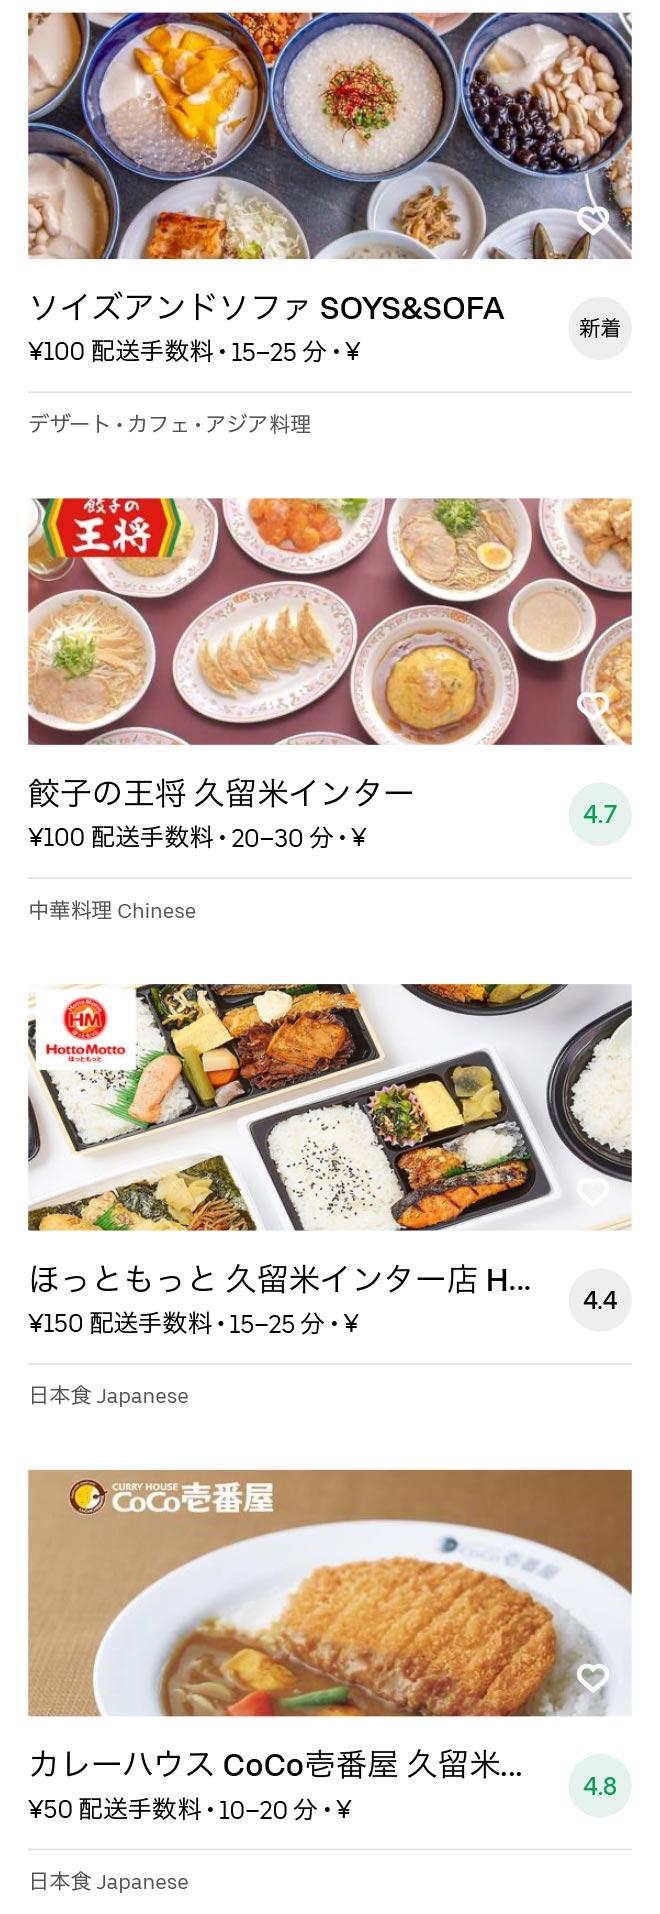 Kurume daigakumae menu 2008 03